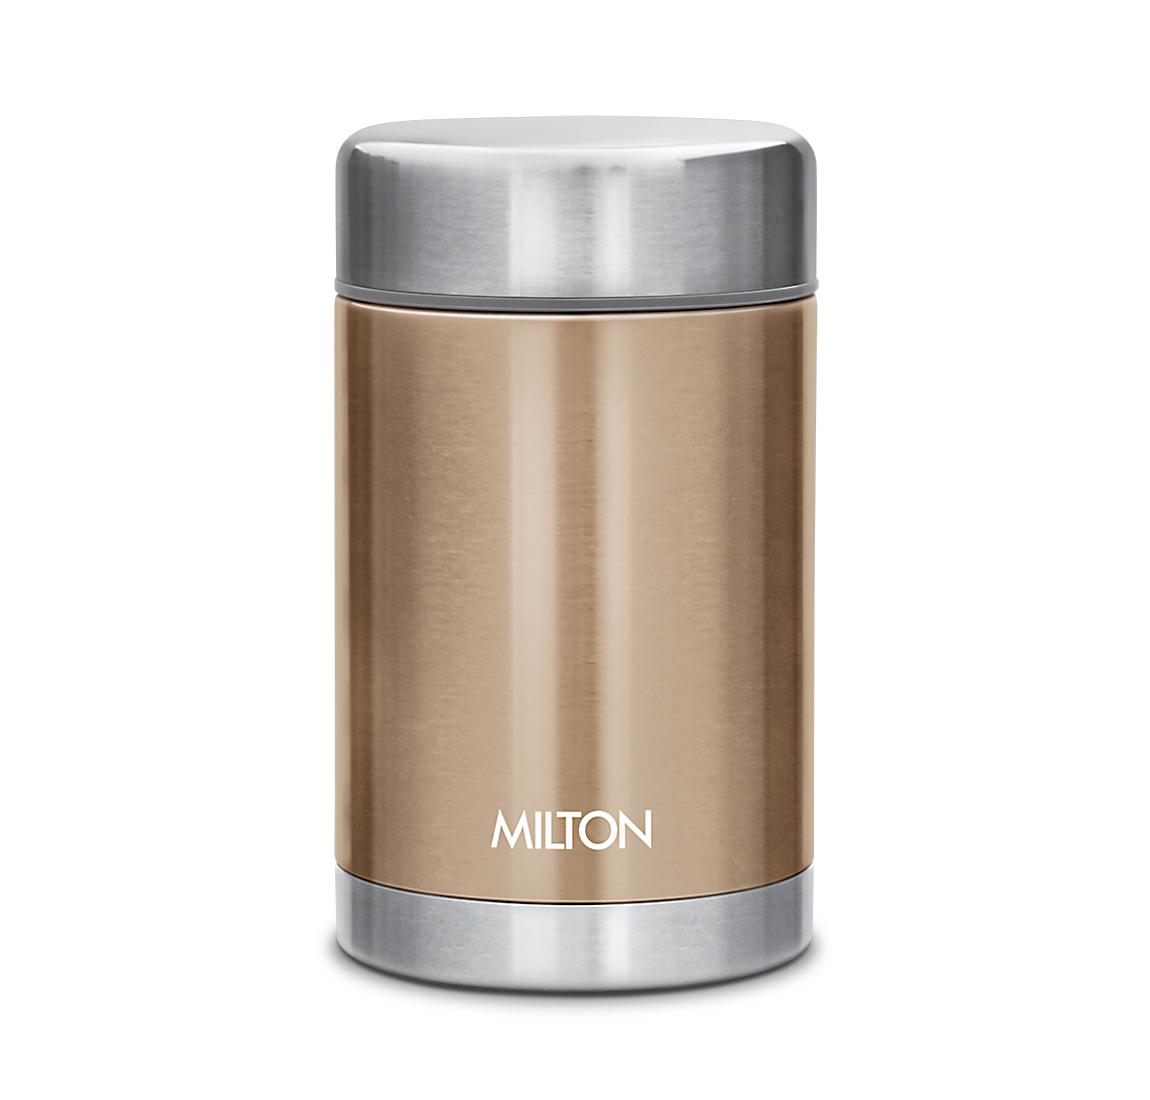 Фото - Термос для еды, Milton, CRUET 550, 0,5л, MT21505-GL